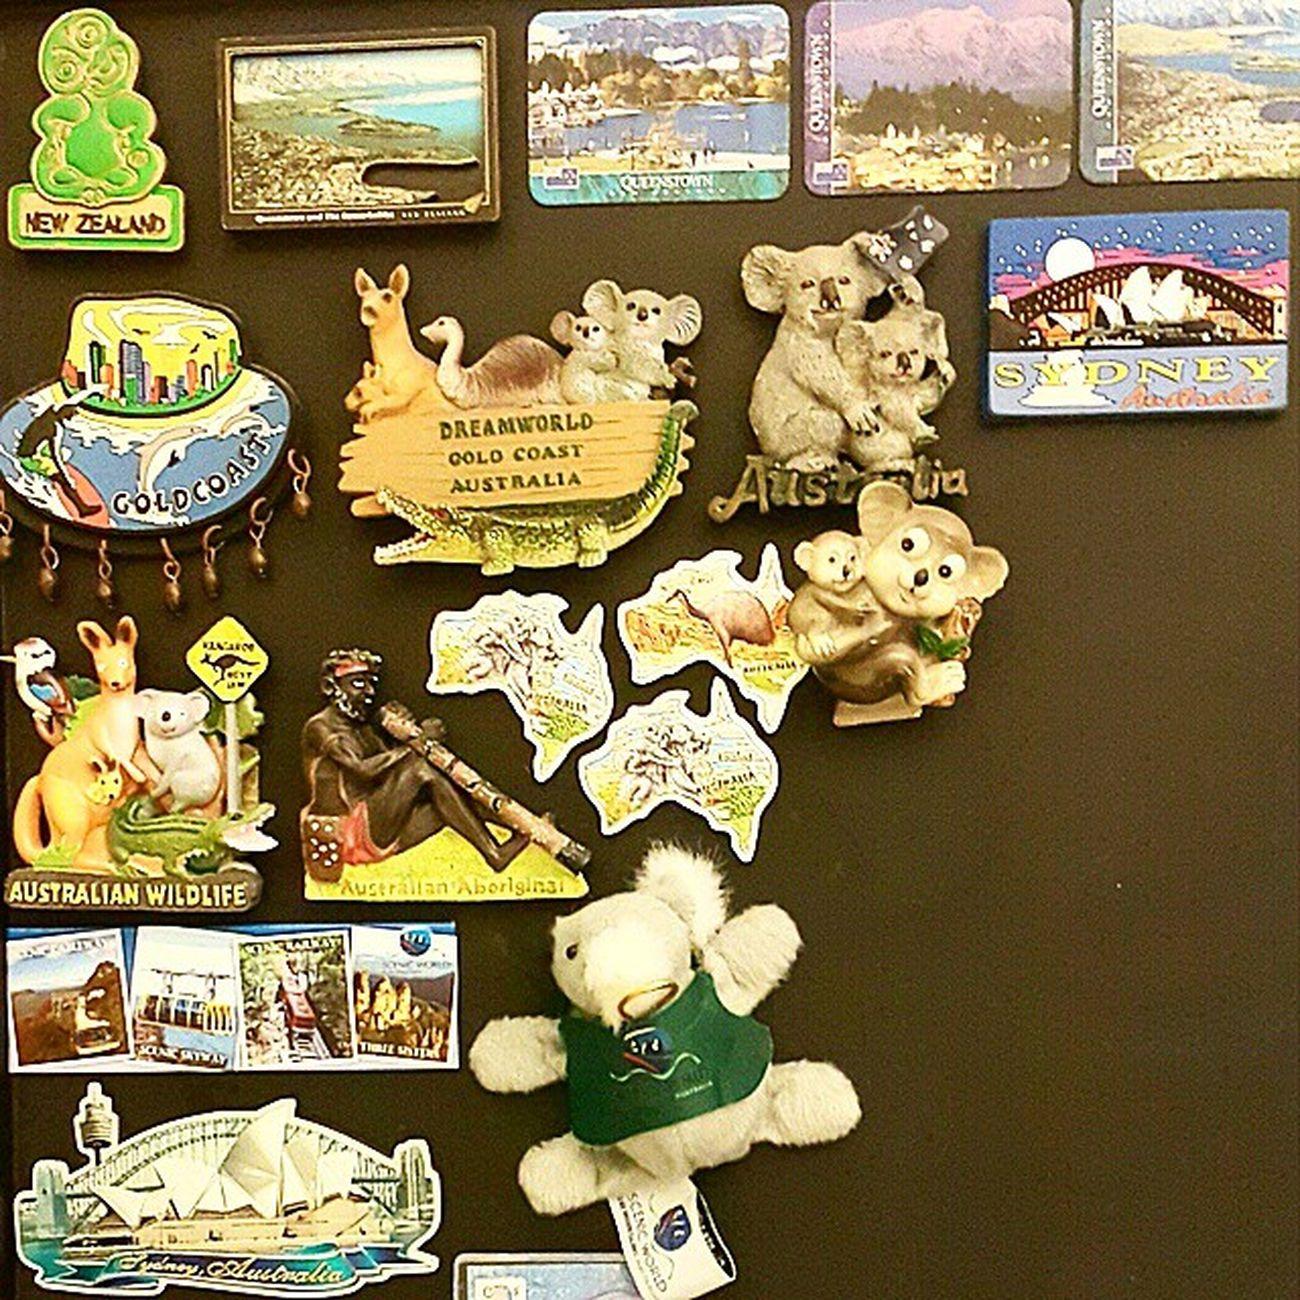 Magnet collections of Australia & New Zealand PrivateCollections PersonalCollections Collections Travelmania Travelers GoldCoast sydney Australia Queenstown NewZealand